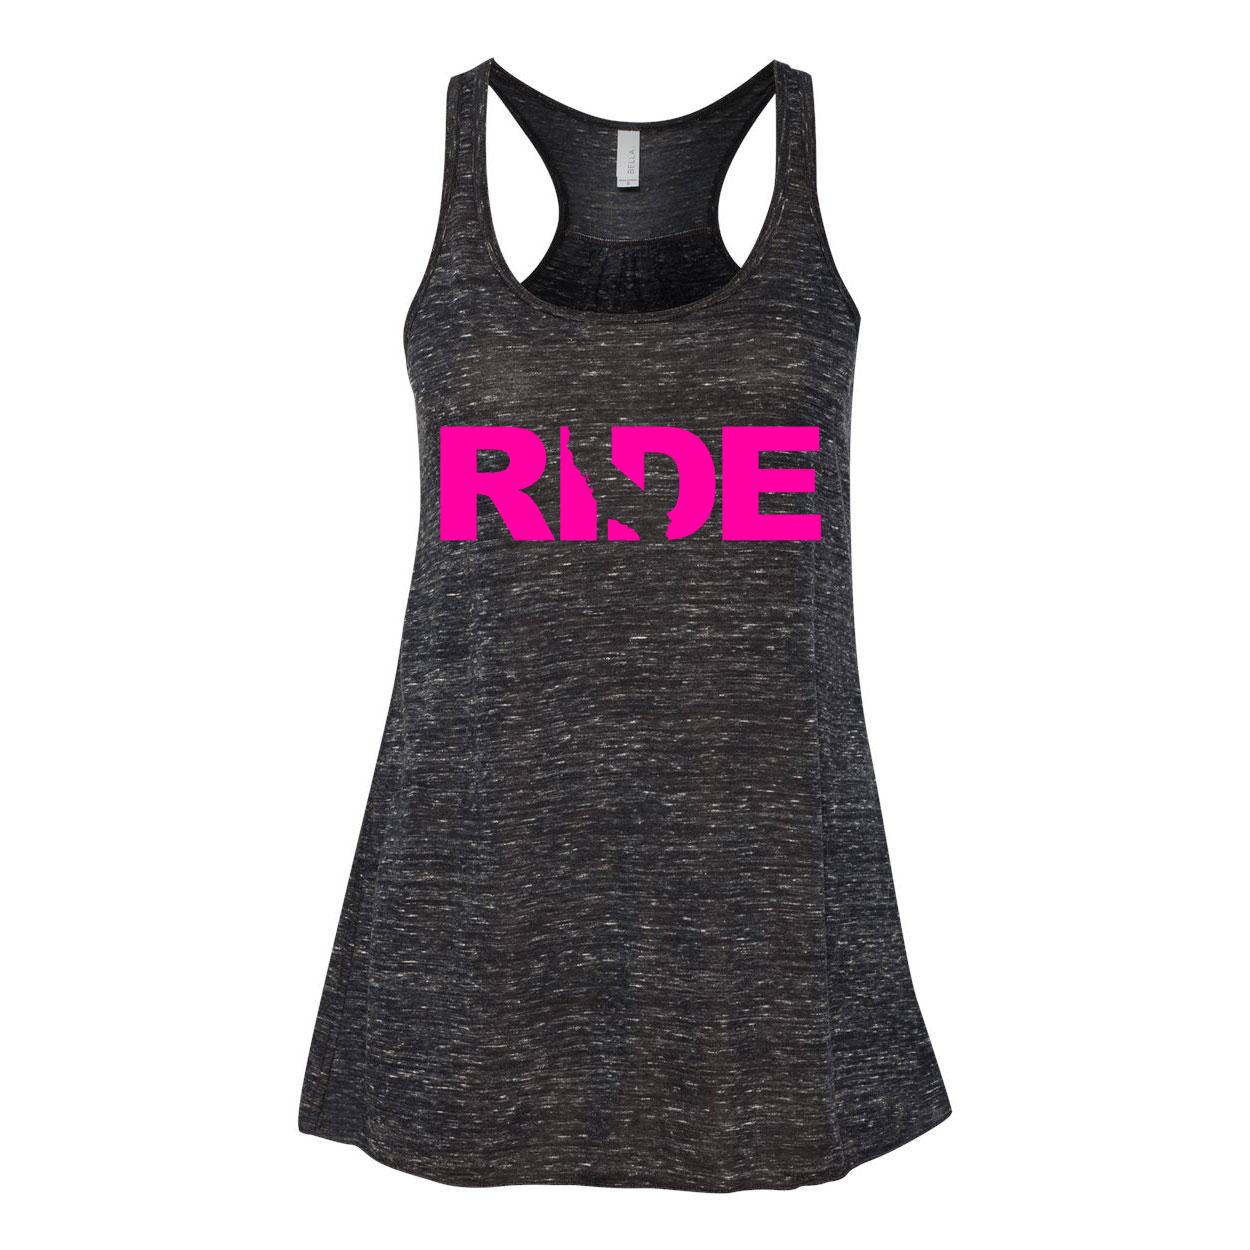 Ride California Classic Women's Flowy Racerback Tank Top Black Marble (Pink Logo)